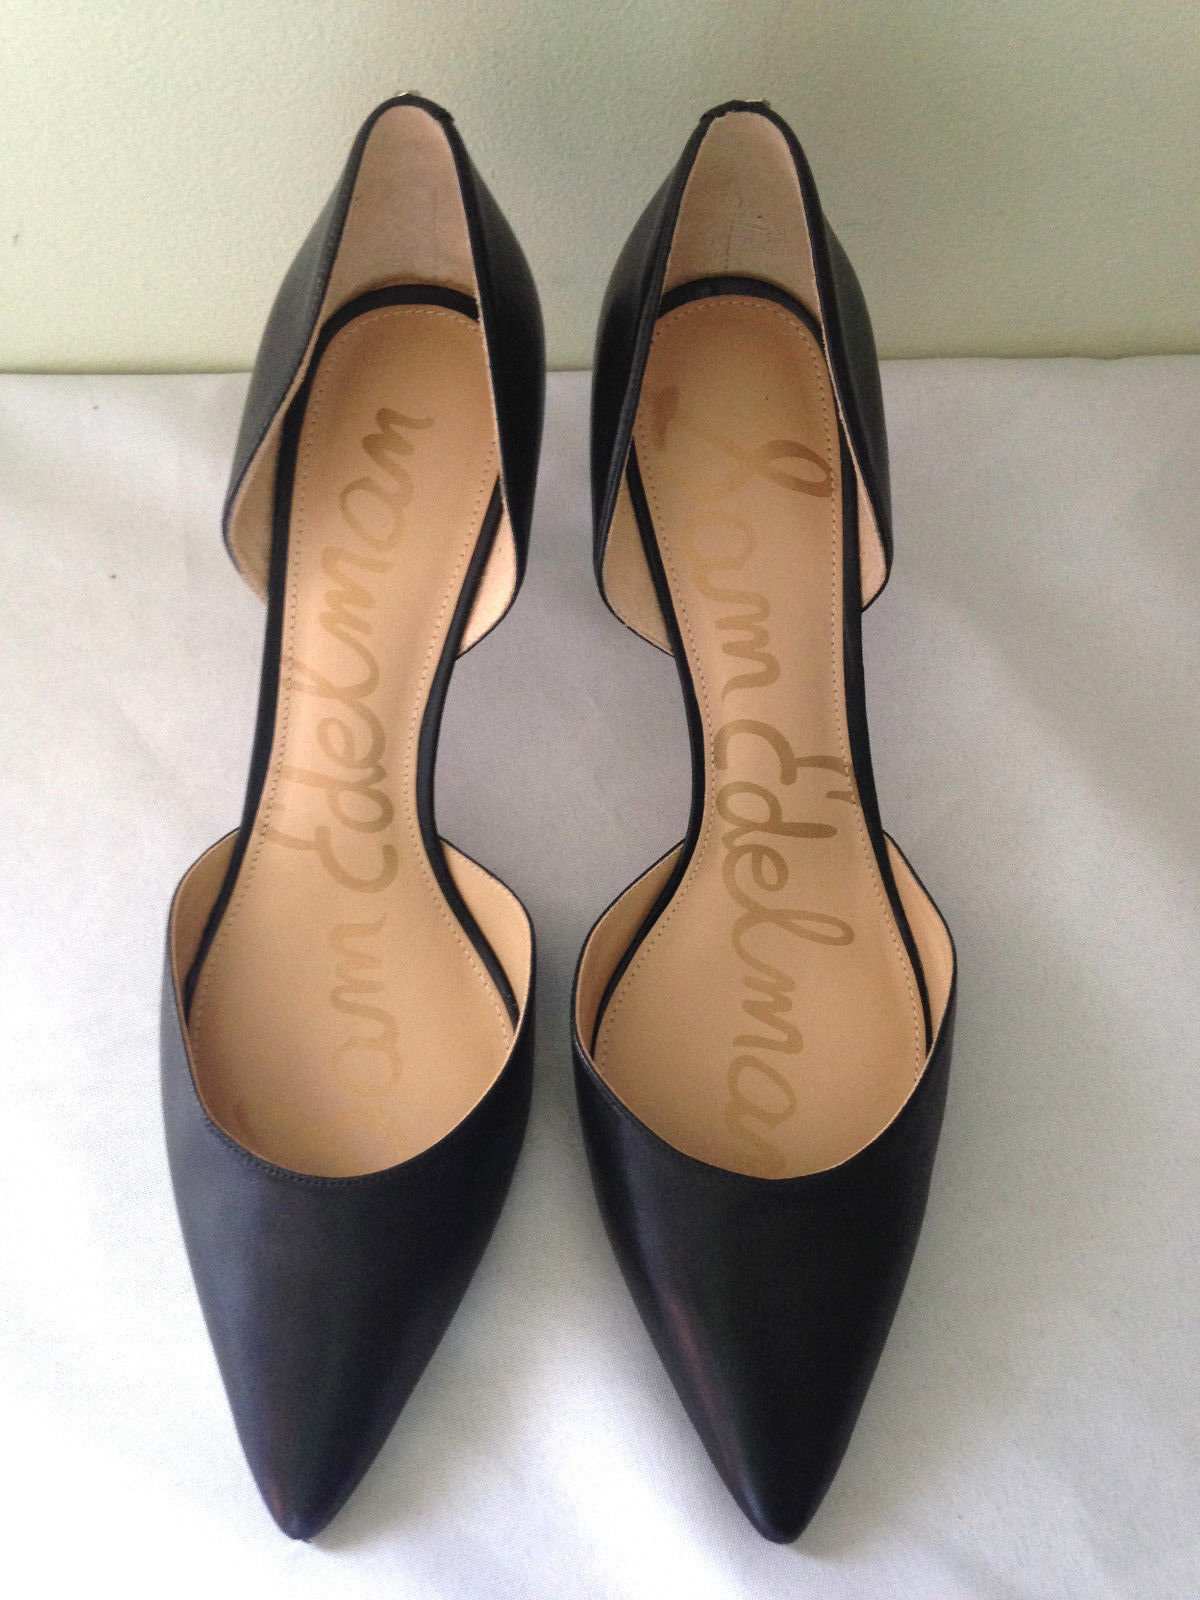 e3ae2609f NEW! Sam Edelman Sexy Classic Black Leather Stiletto TELSA Heels Pumps 13 M   140